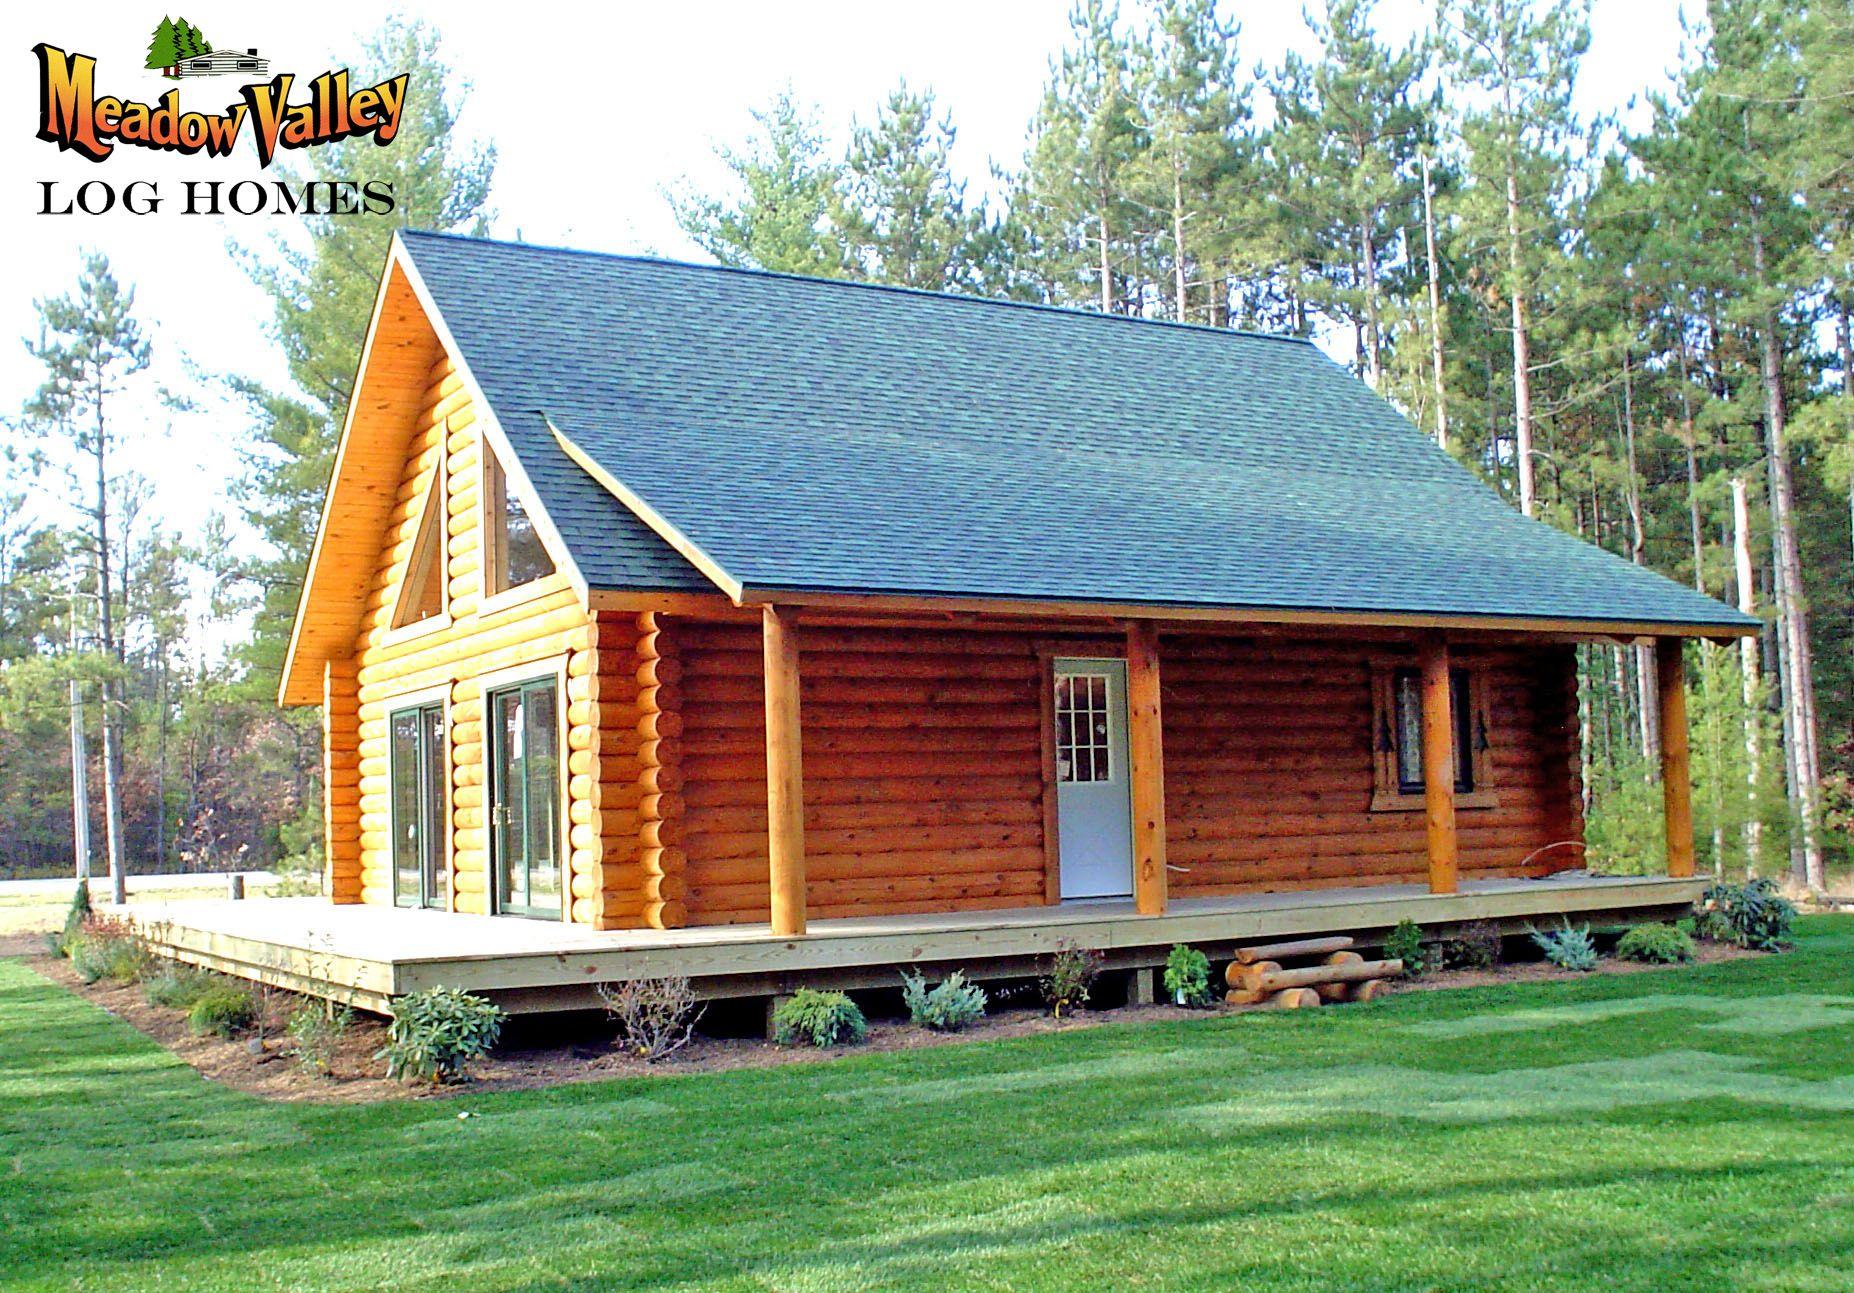 Log cabin on a lake royalty free stock photography image 7866317 - Bath